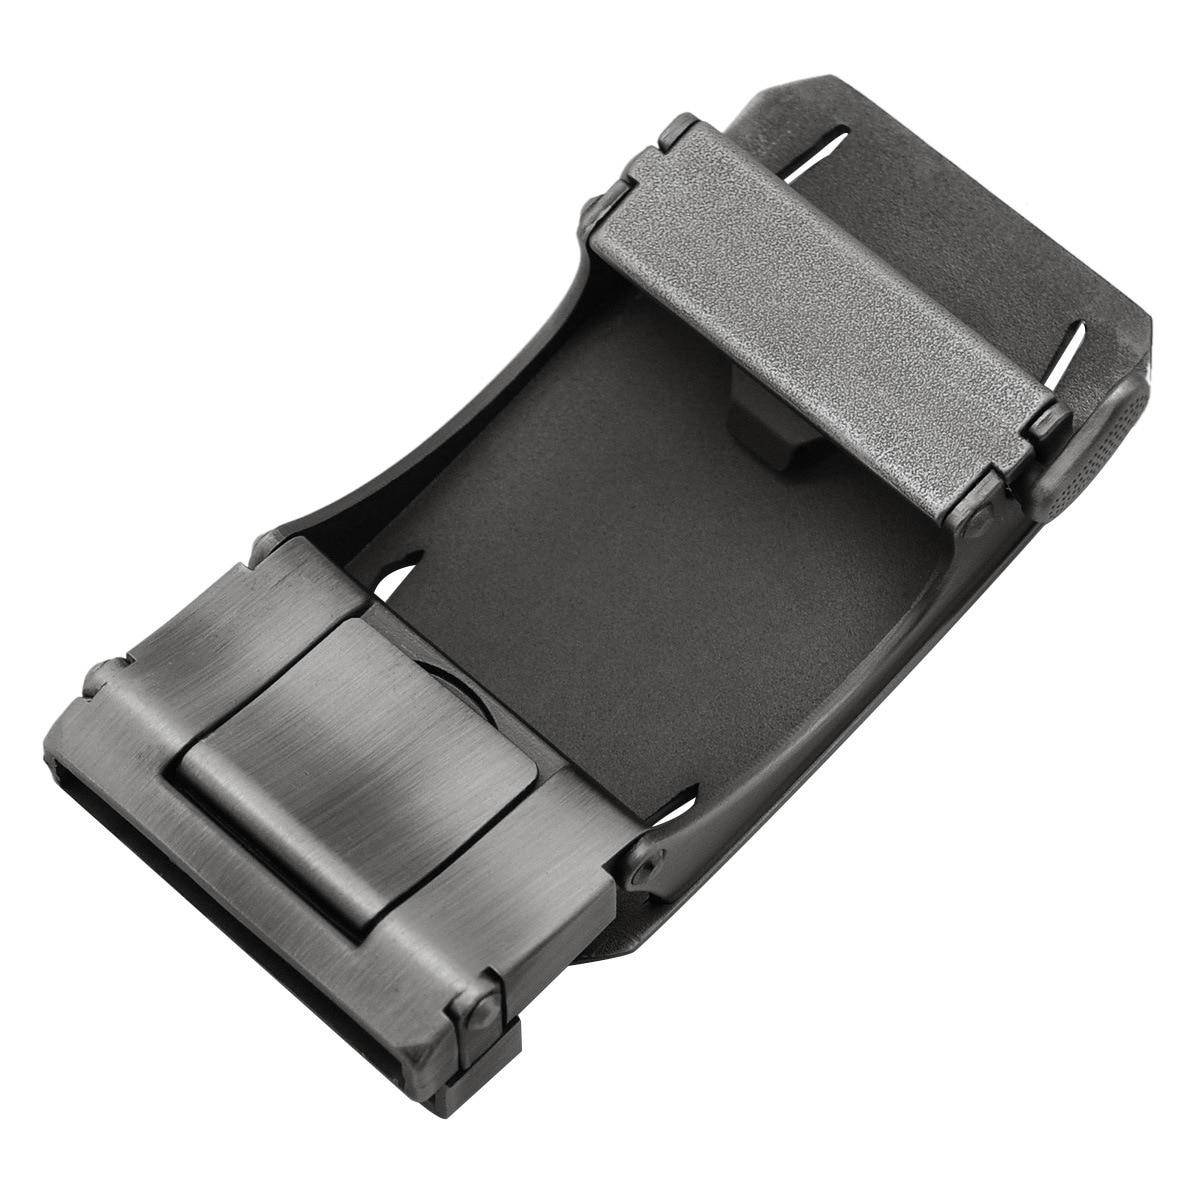 Personalized Men's Belt Buckle Head Zinc Alloy 3.5 Automatic Belt Buckles Man Pants Buckles Accessories Custom Engrave Logo Gift